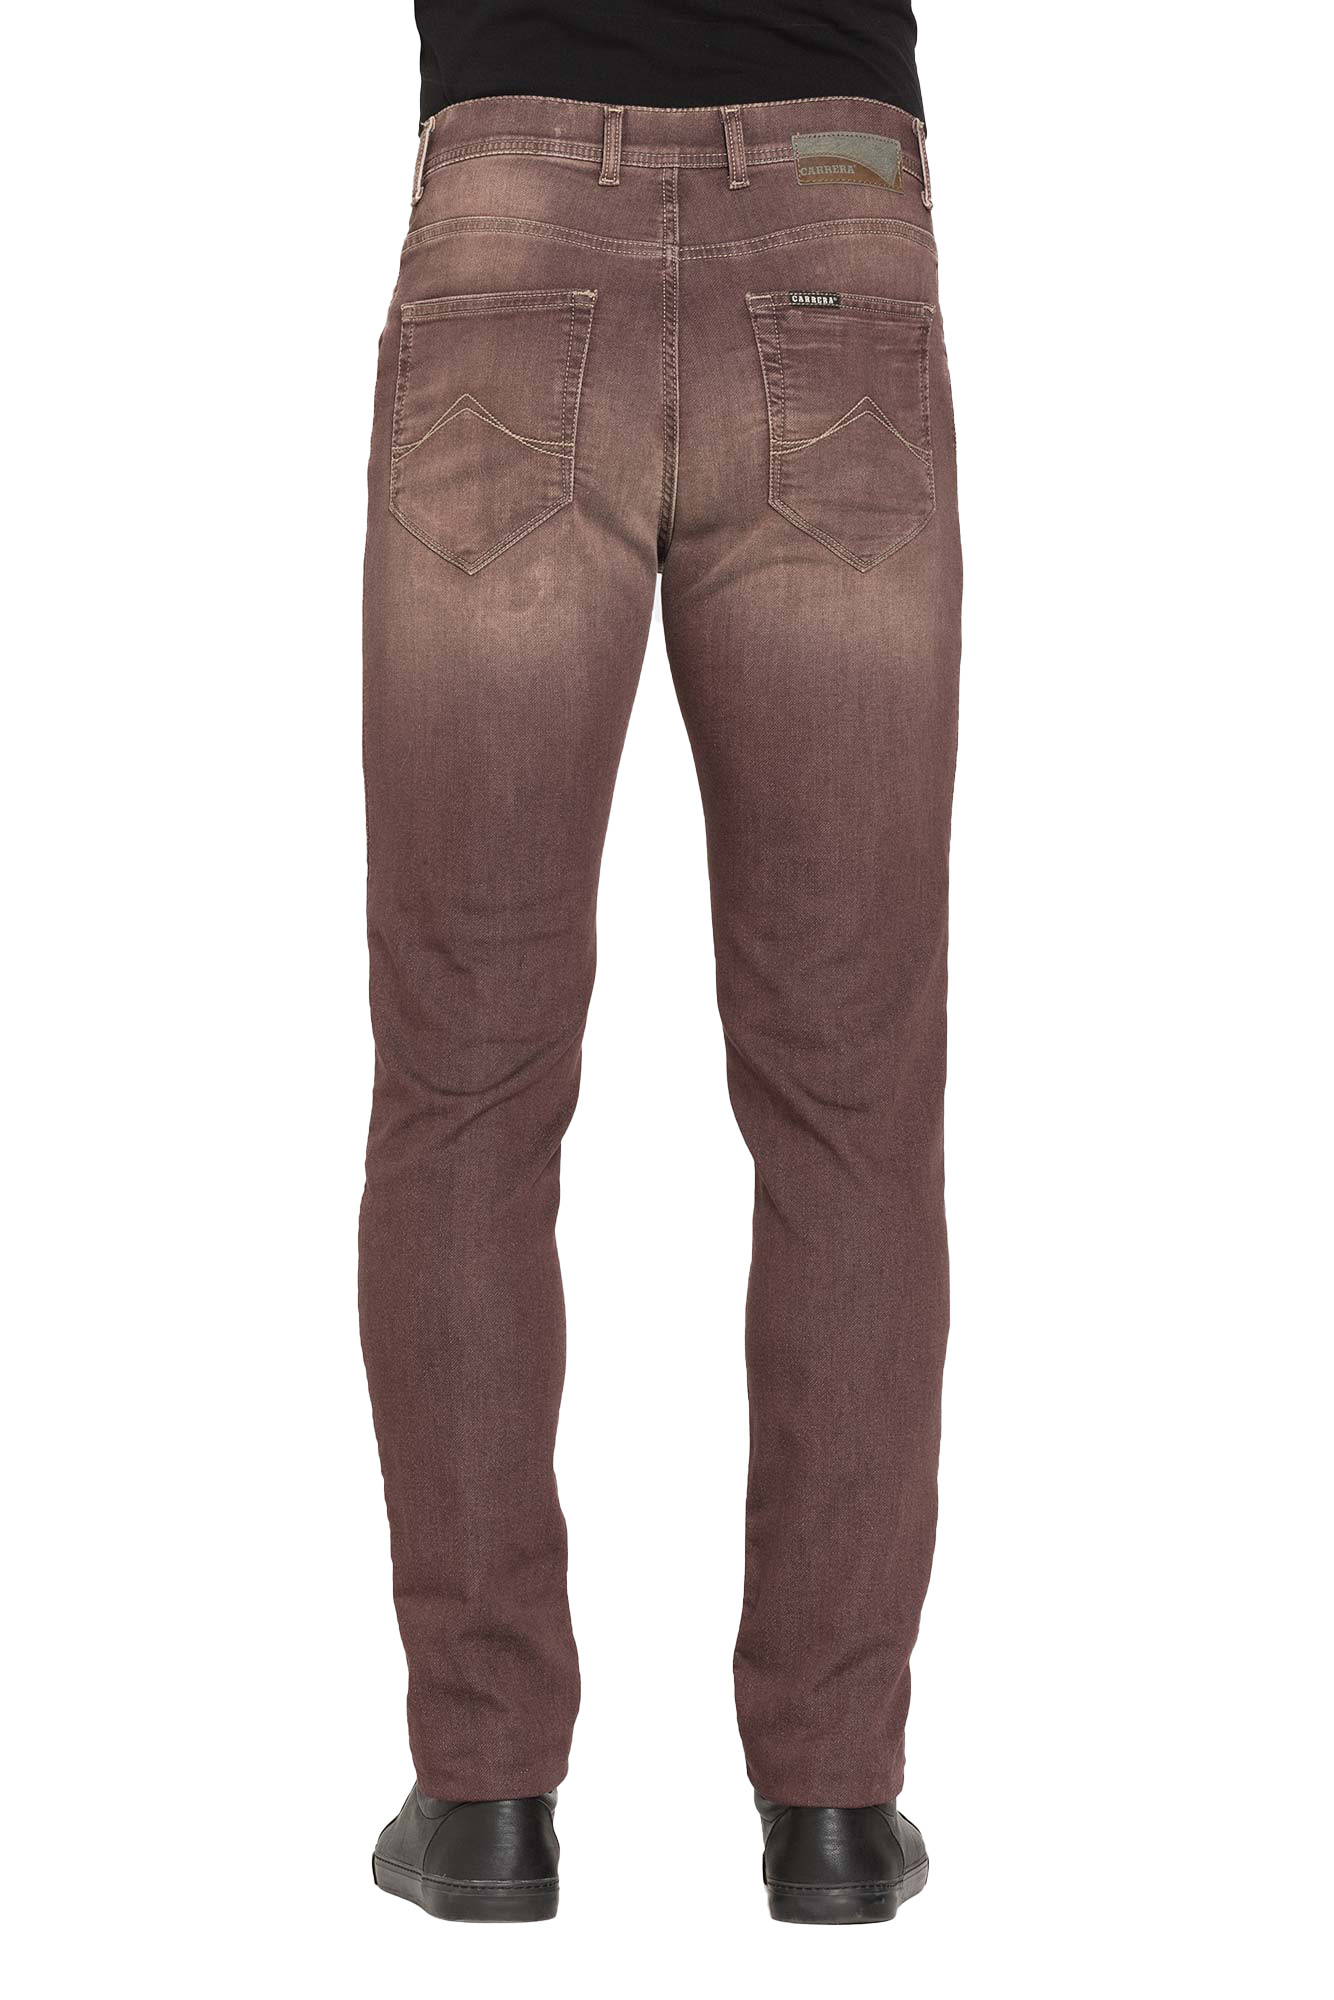 Carrera-Jeans-Jeans-per-uomo-tinta-unita miniatura 7